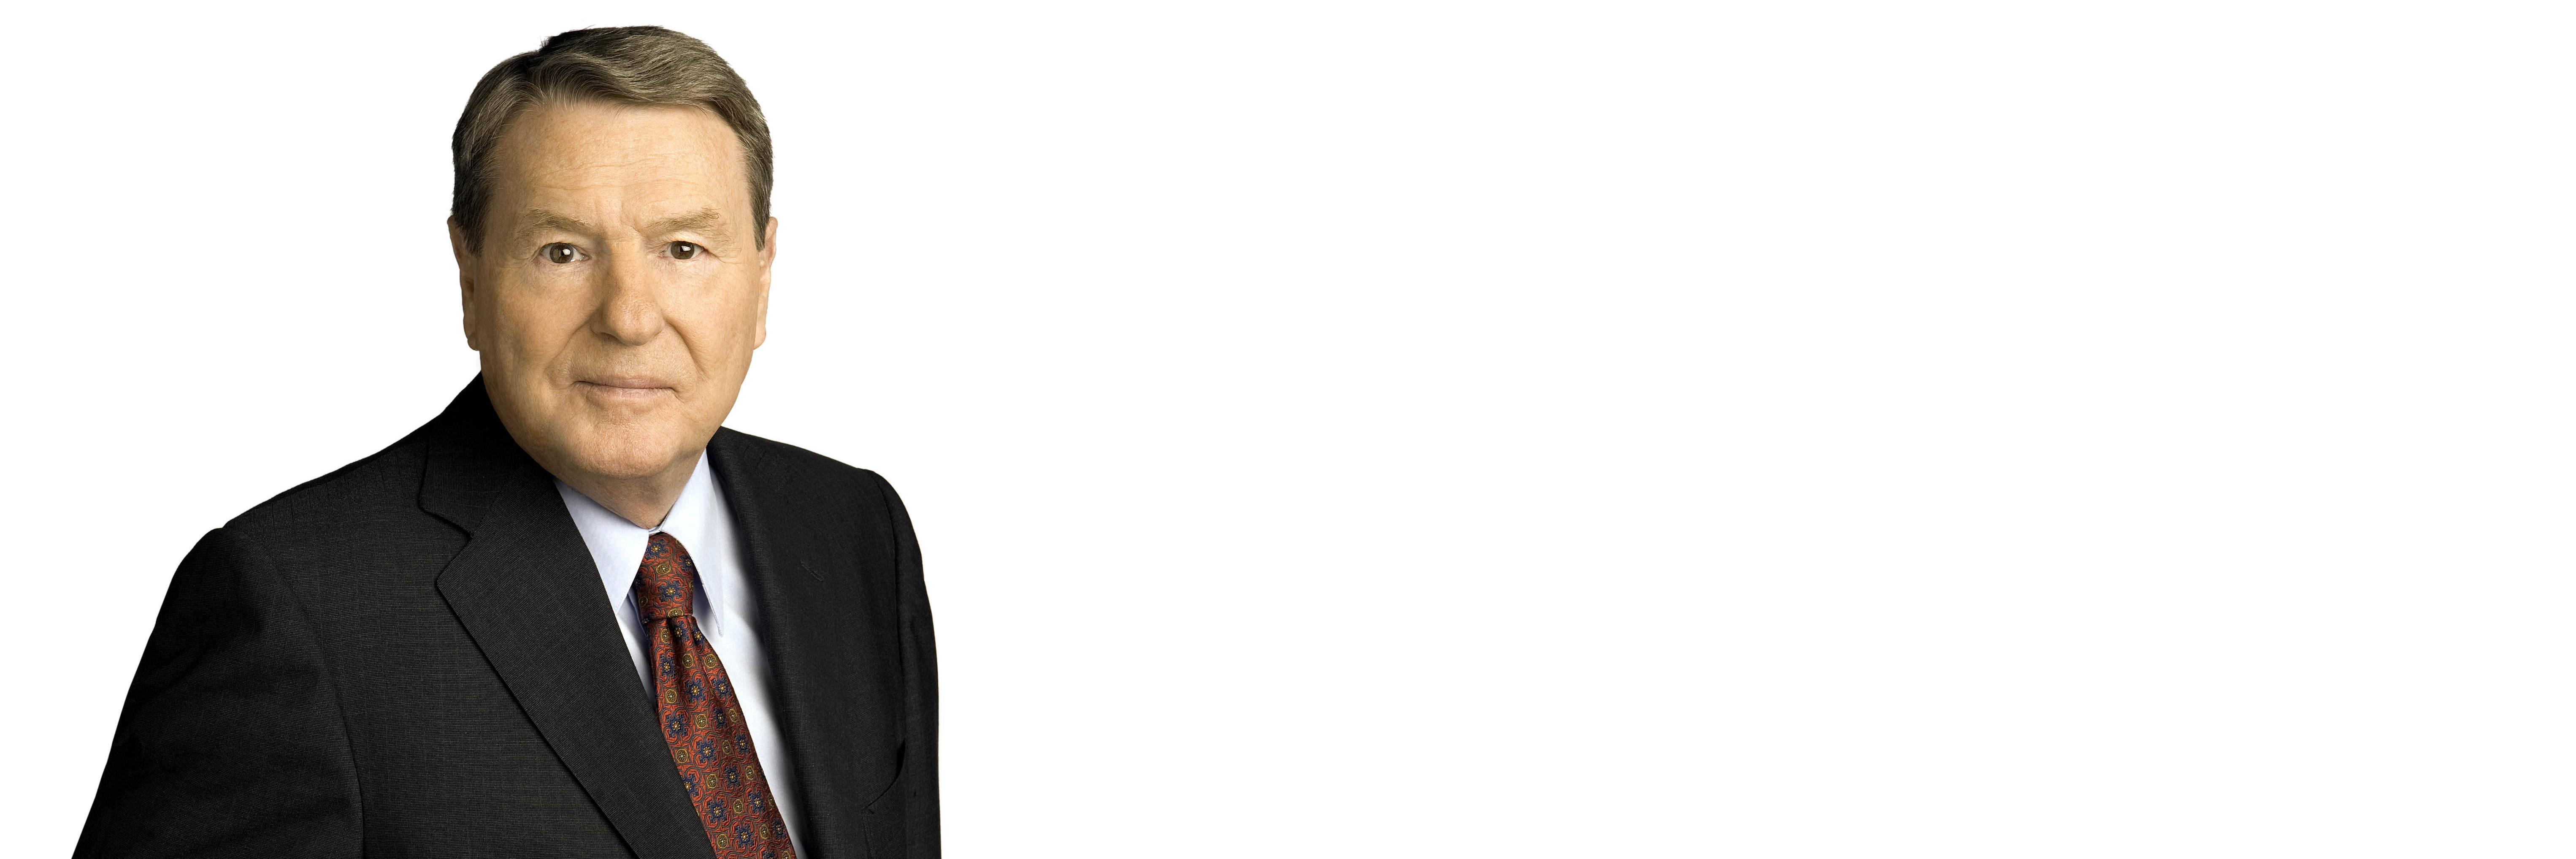 profile photo of Jim Lehrer